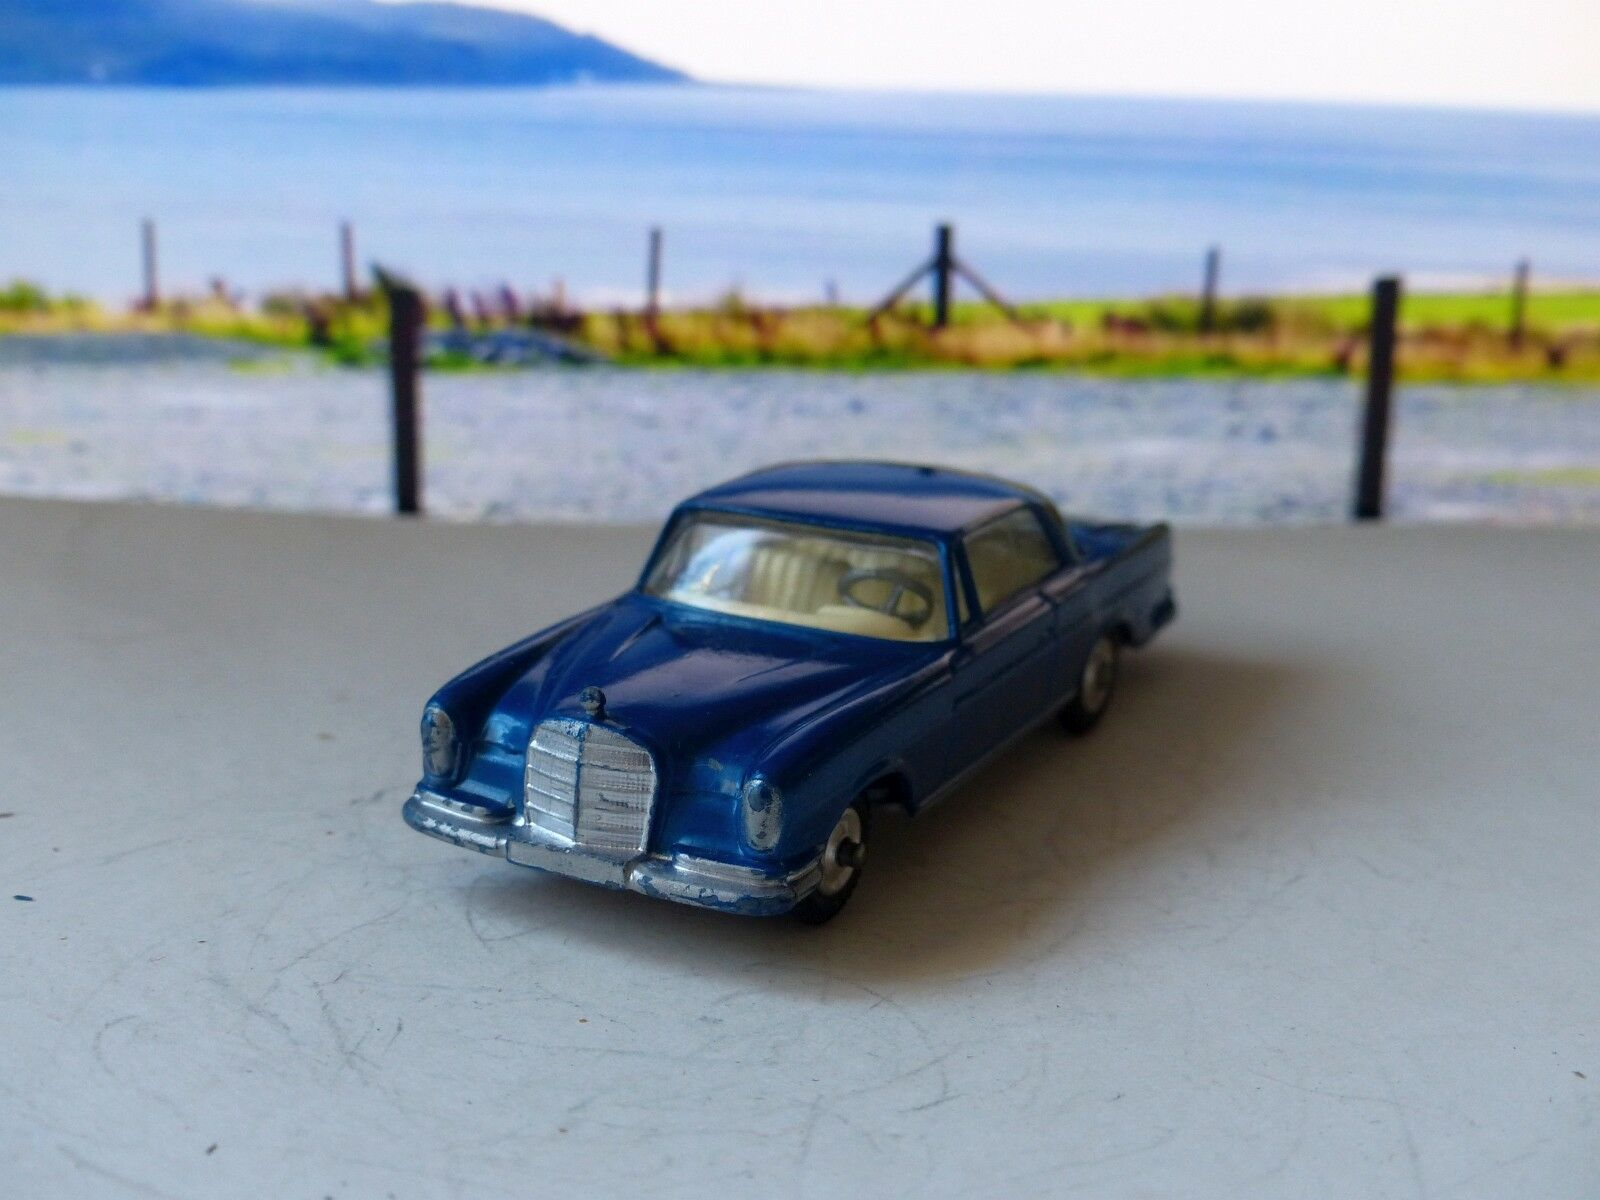 Corgi Toys 253 Mercedes 220SE Coupe with original box